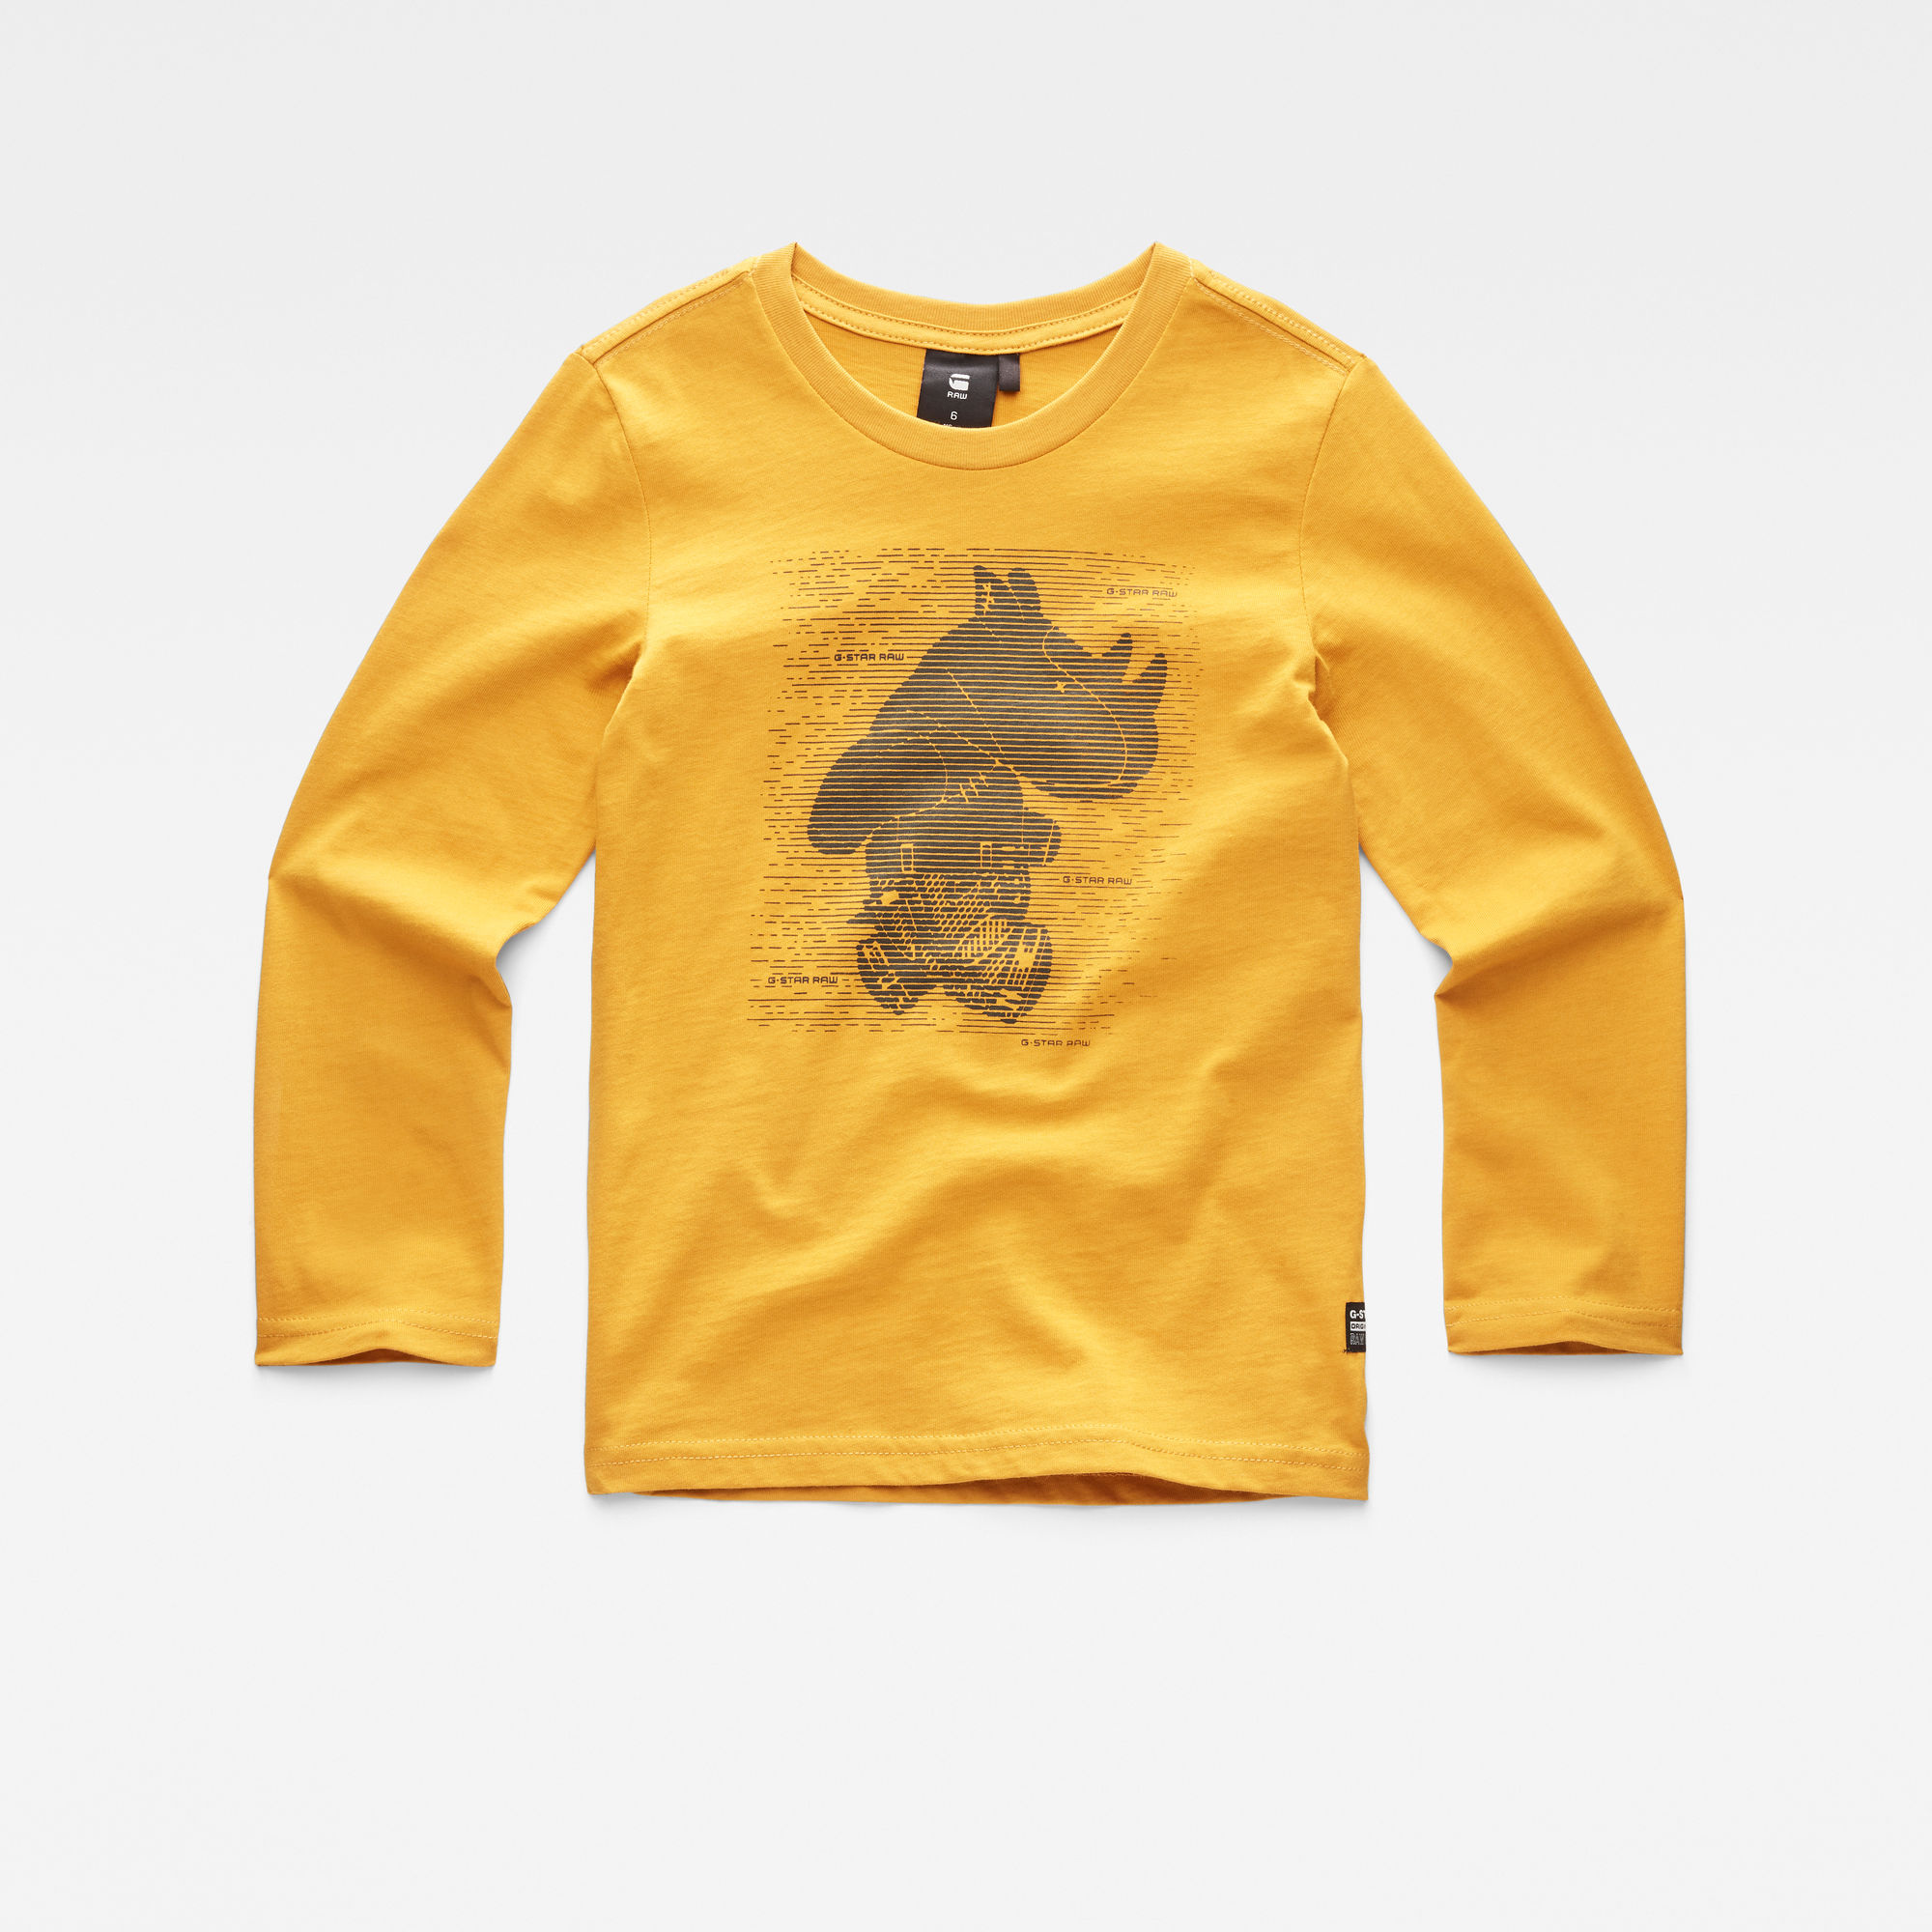 G-Star RAW Jongens T-shirt Geel